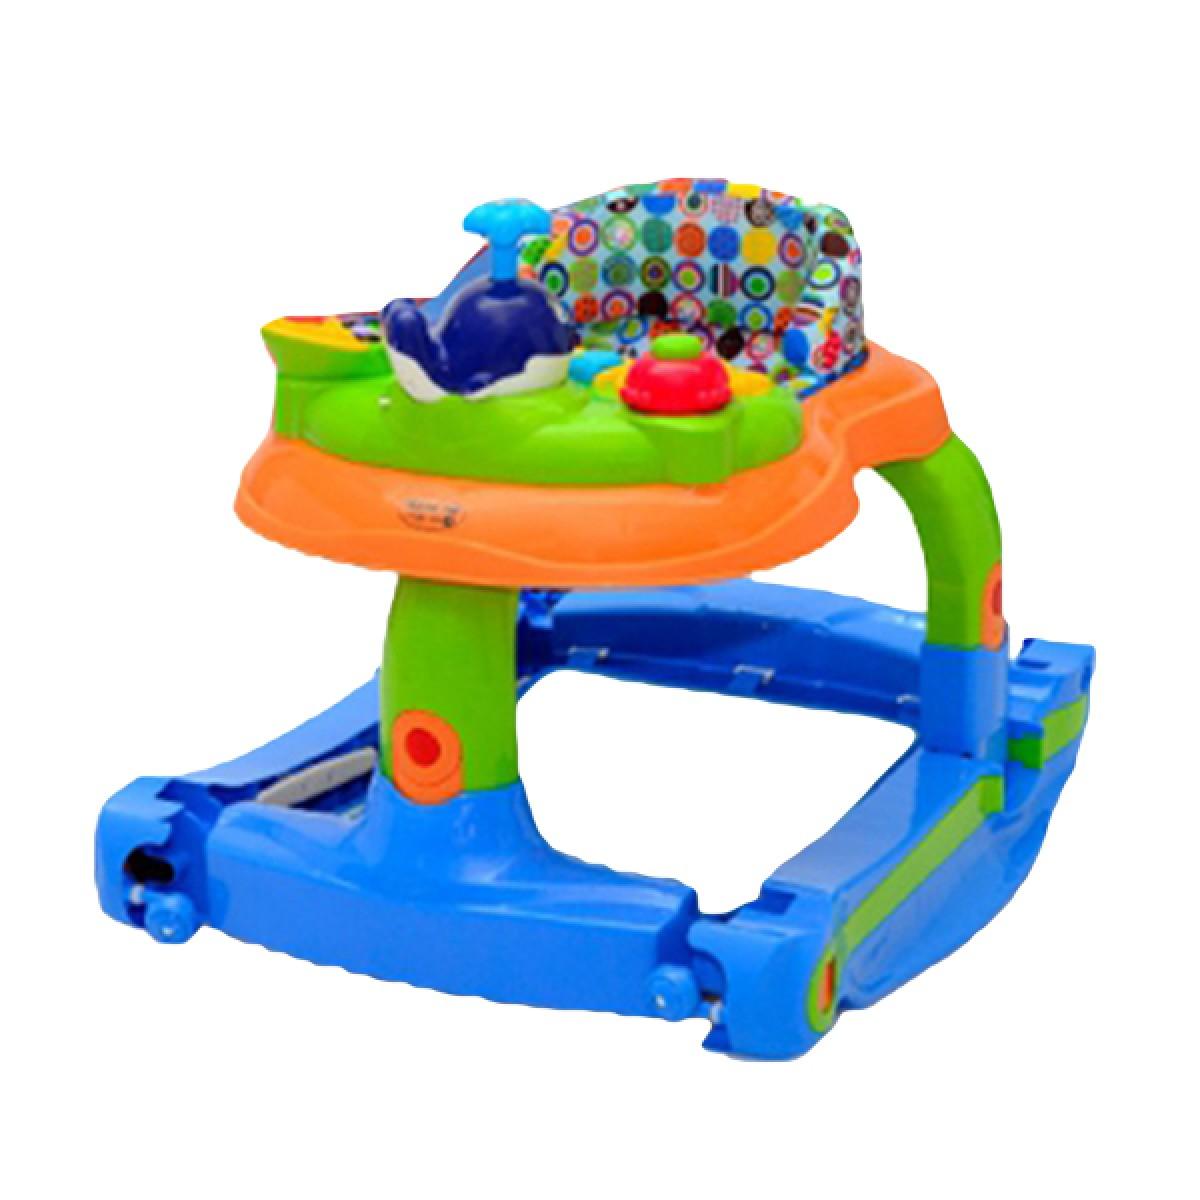 (Cd-W090rc) Baby Walker - Kico Baby Center